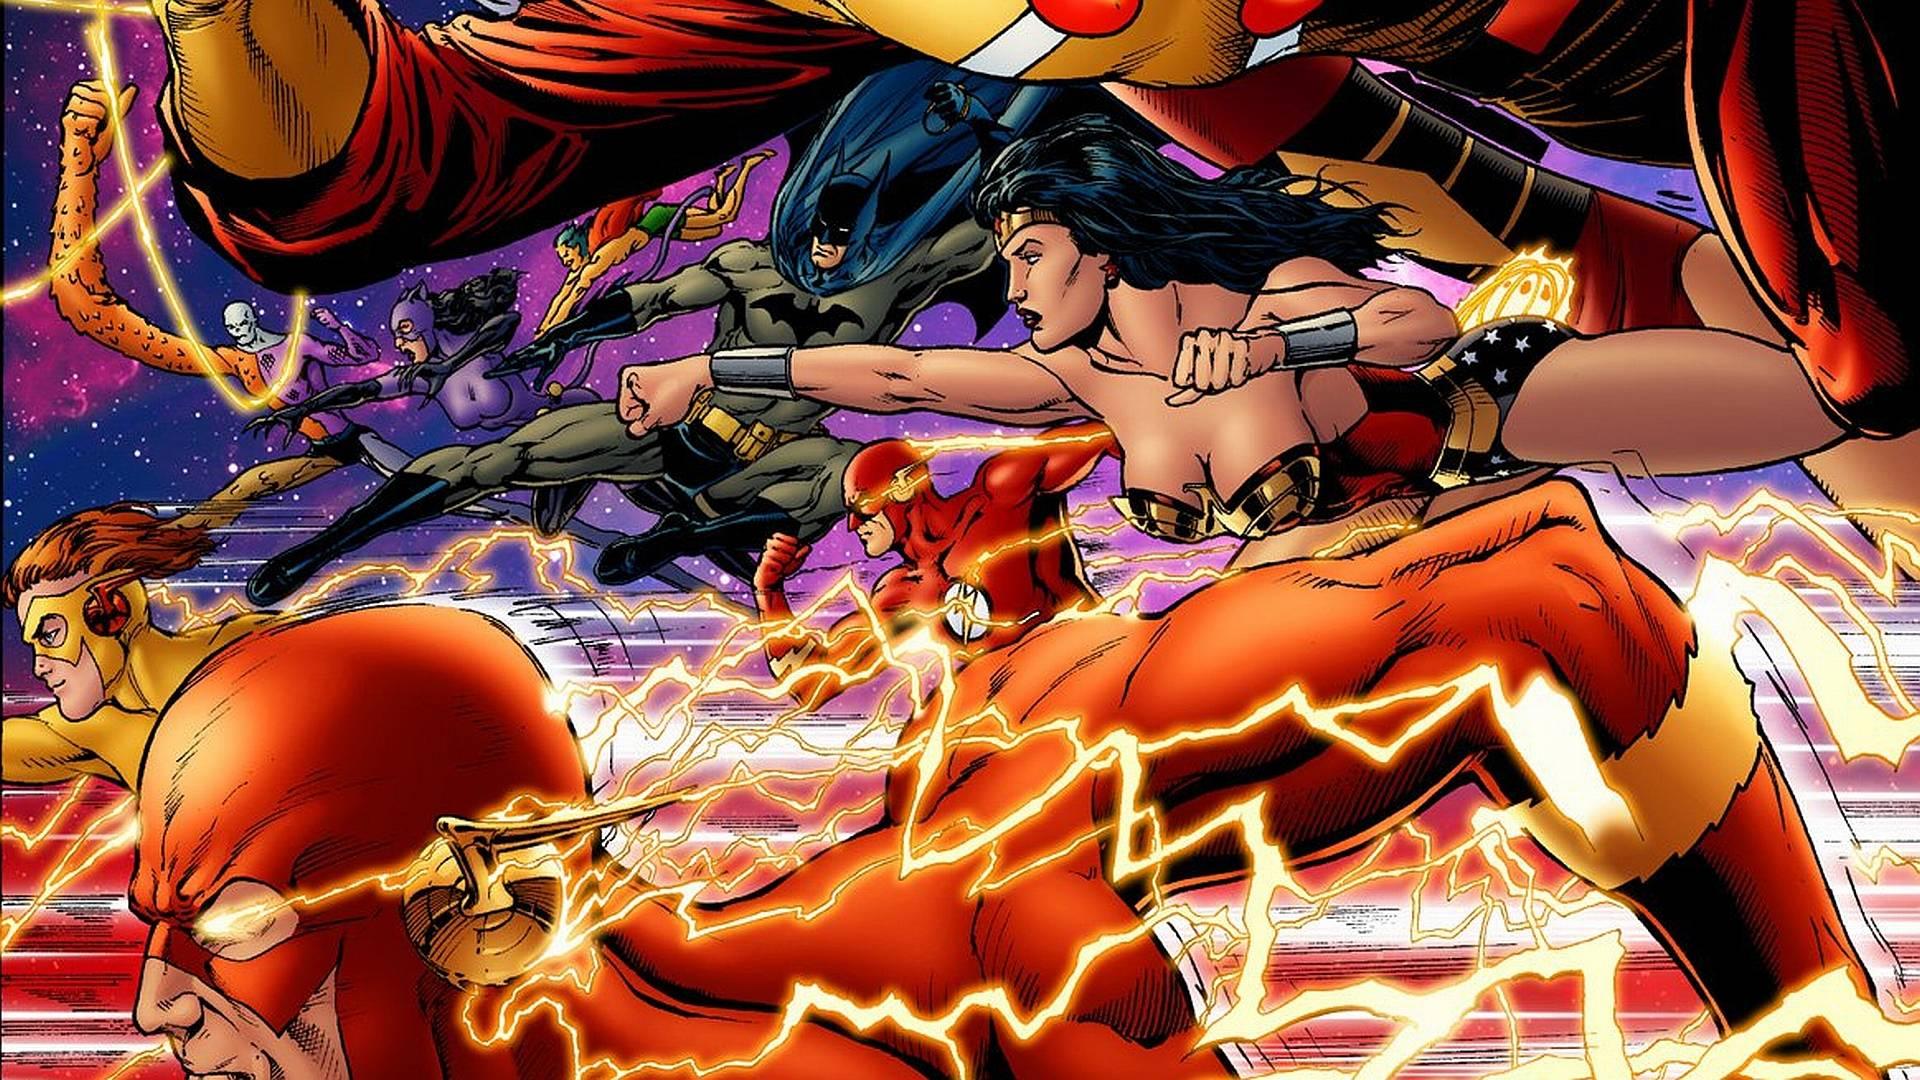 DC Comic Wallpapers 1920x1080